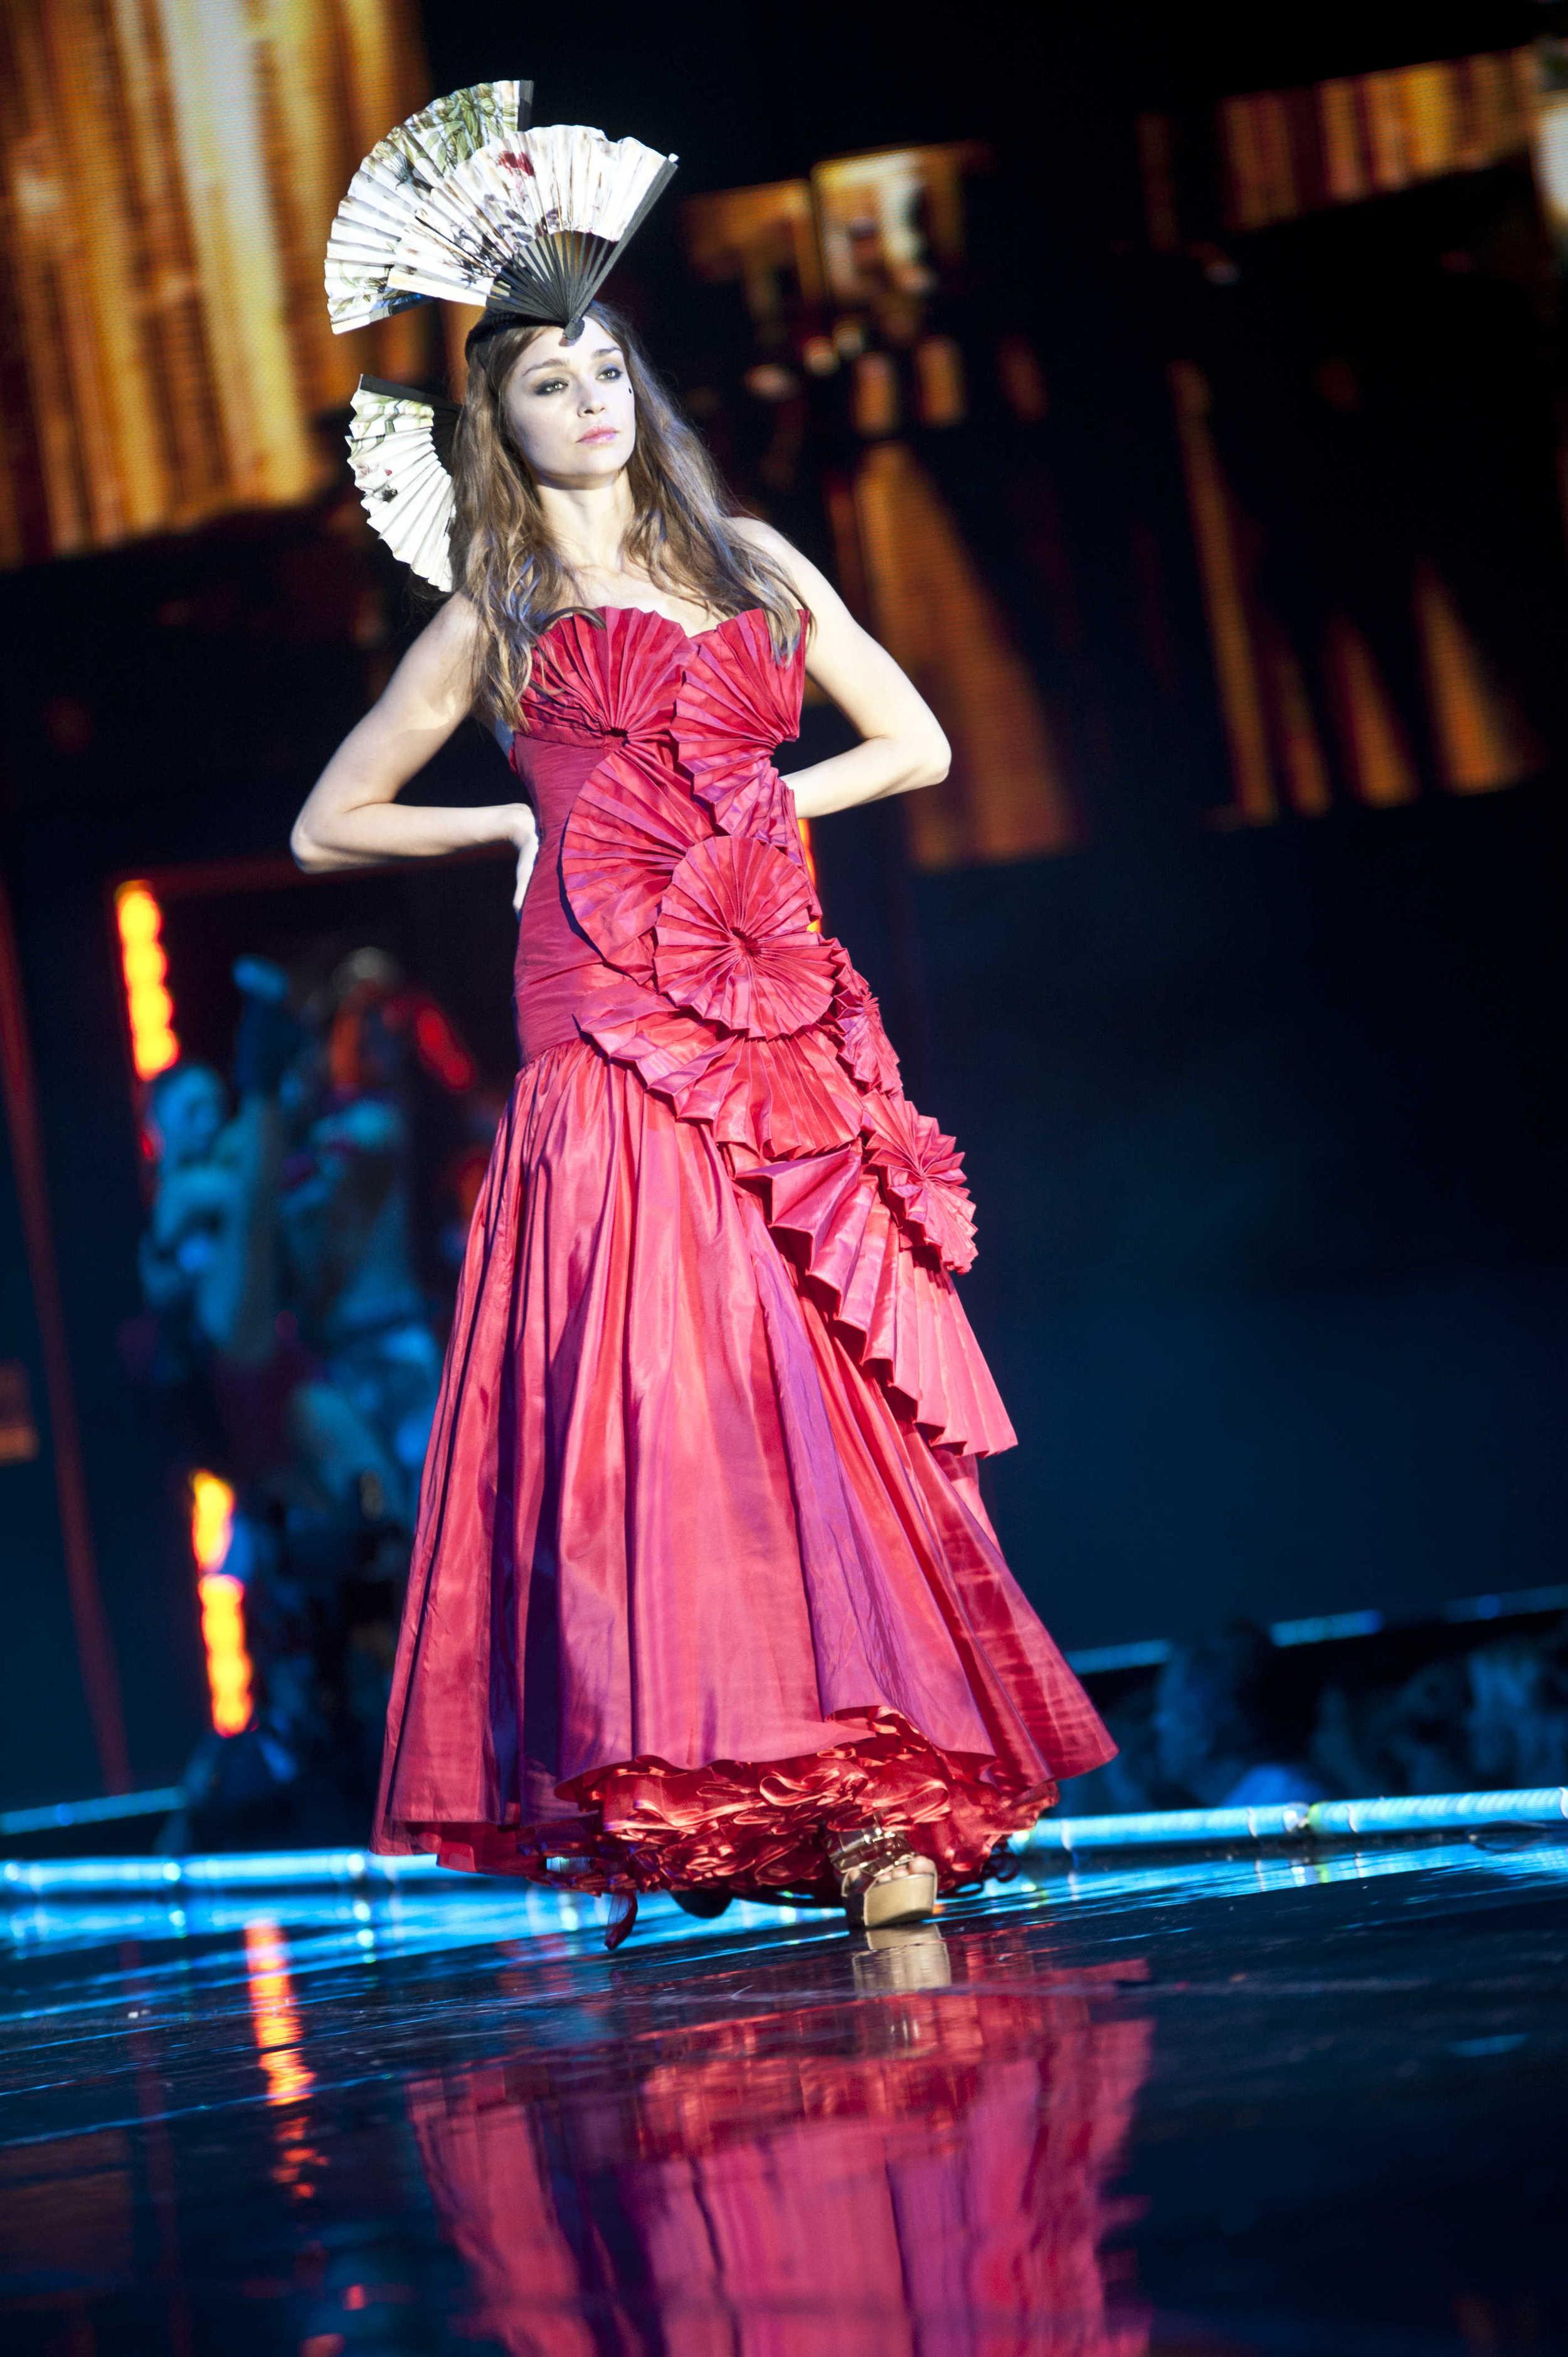 dennisdavis_photography_fashion_catwalk_red dress_clothes show.jpg